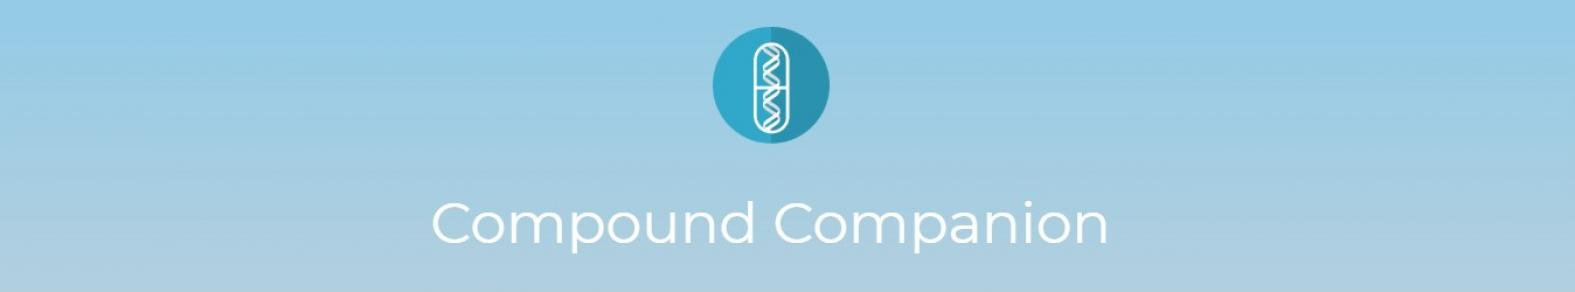 compoundcompanion_banner.jpg